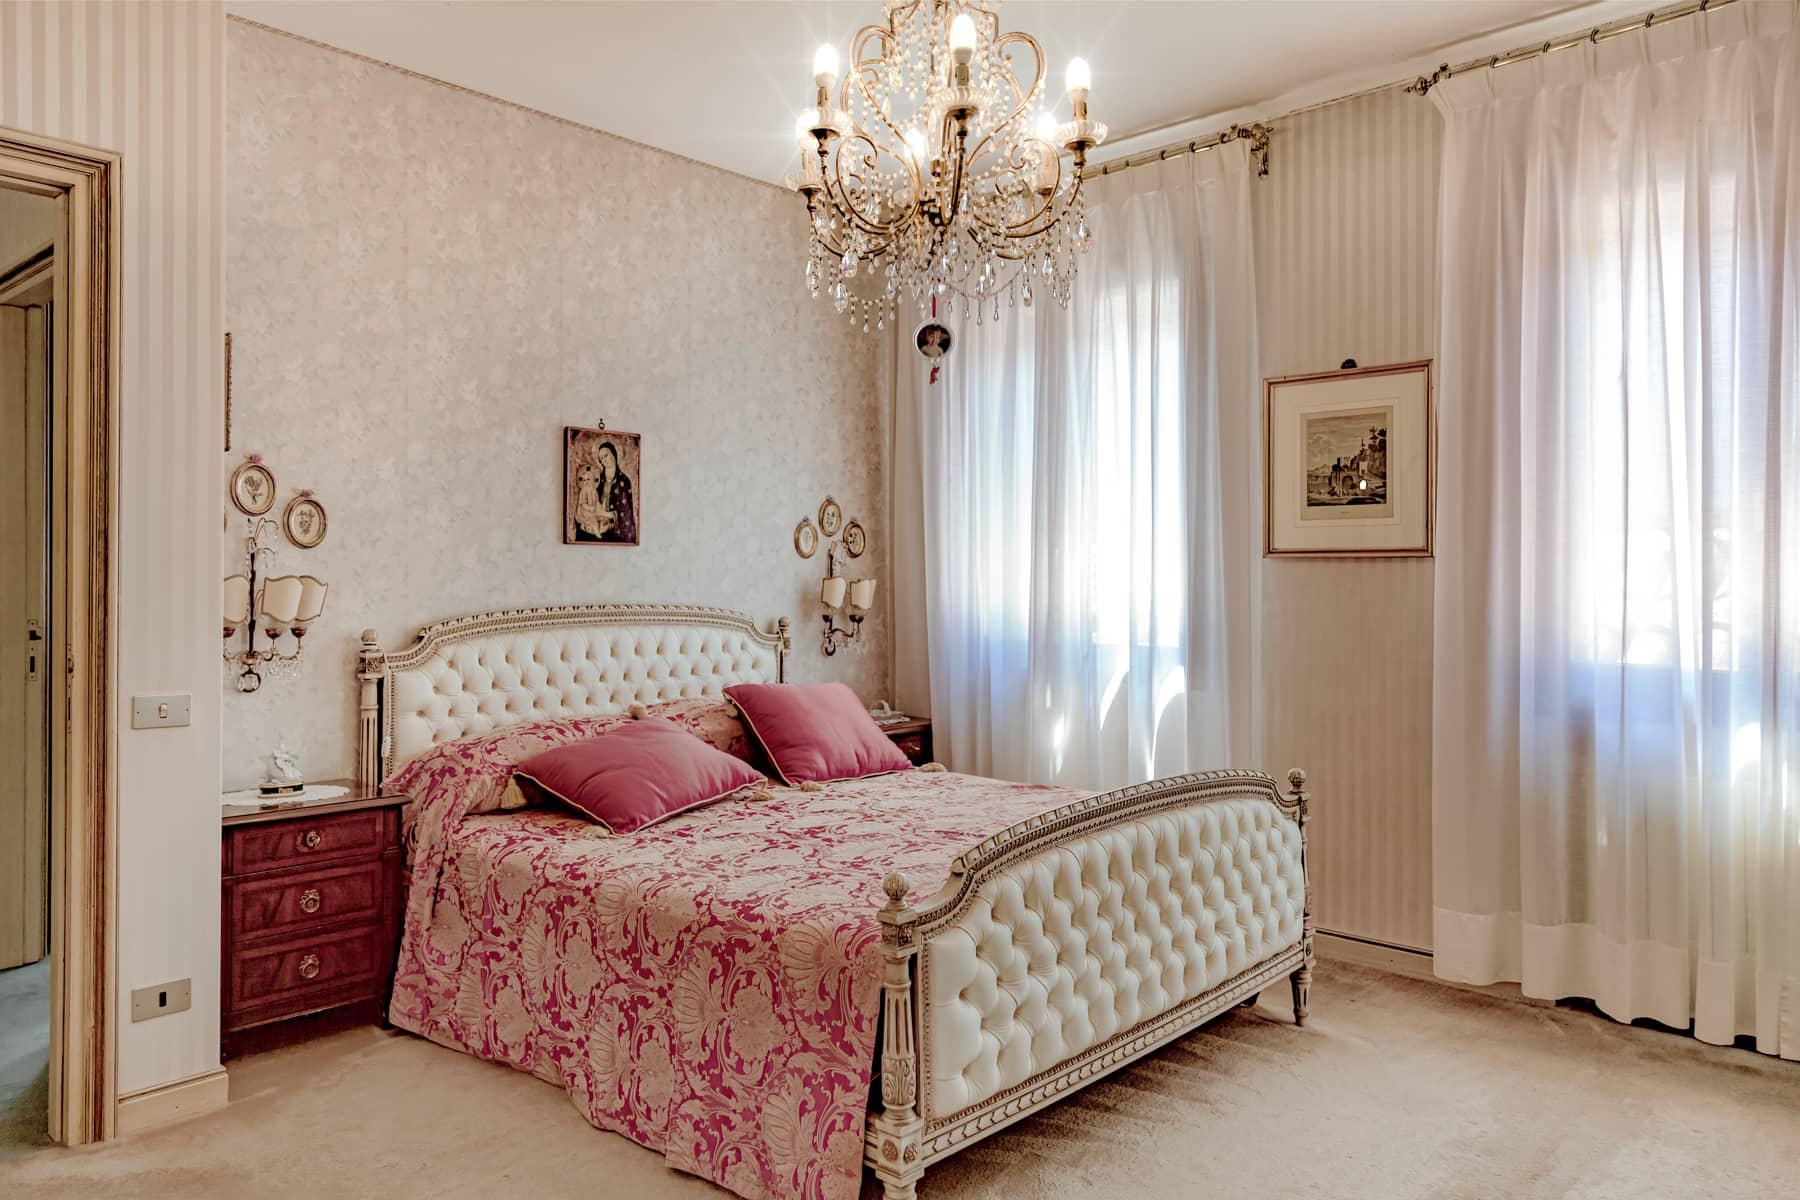 Villa in Vendita a Carbonera: 5 locali, 850 mq - Foto 7